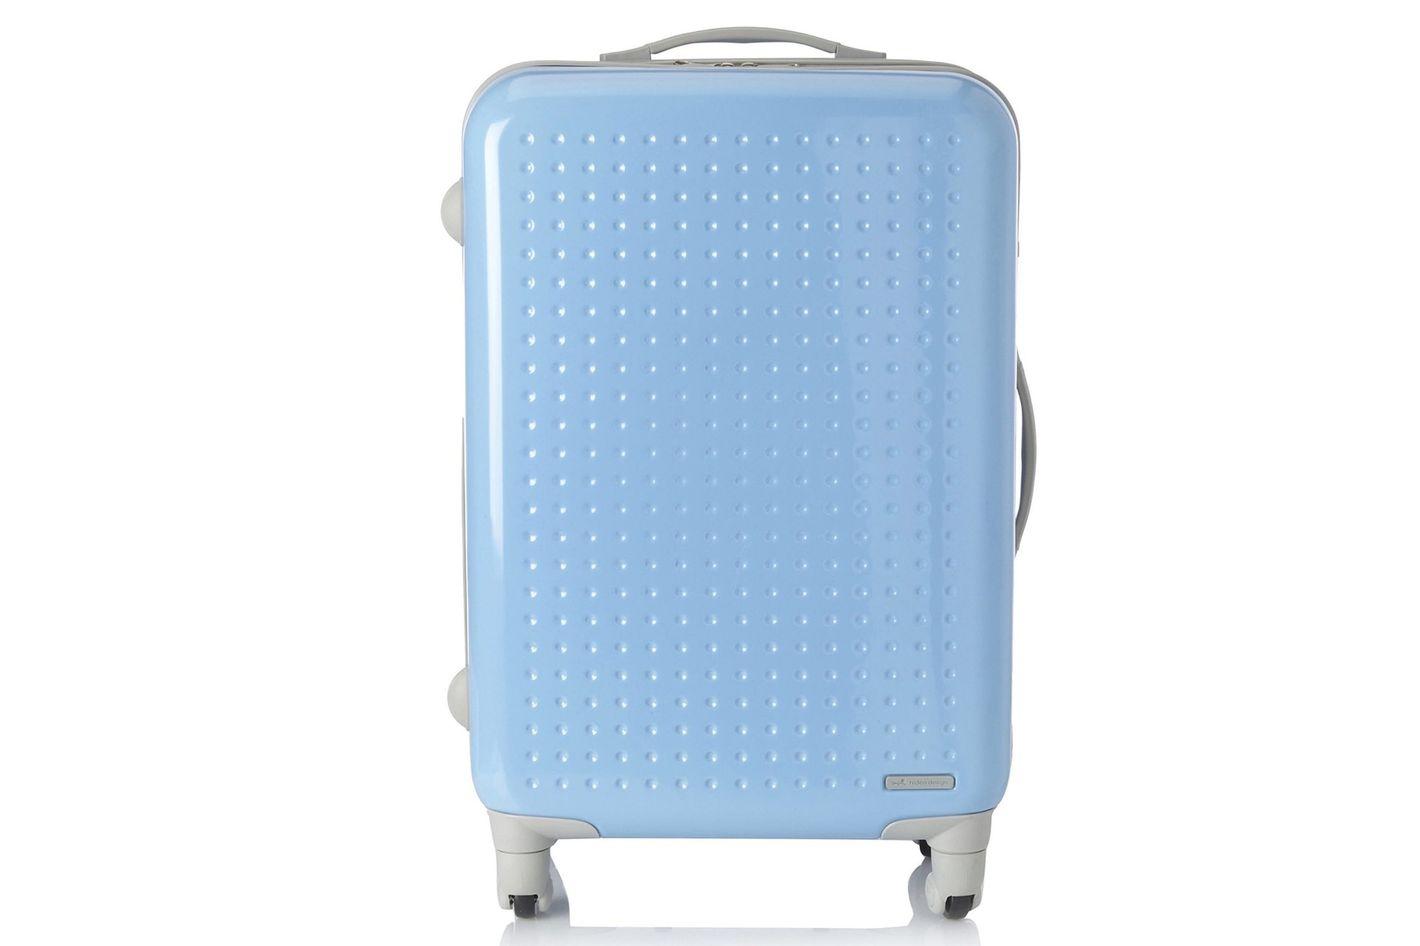 Hideo Wakamatsu Jelly Bean 25 Suitcase